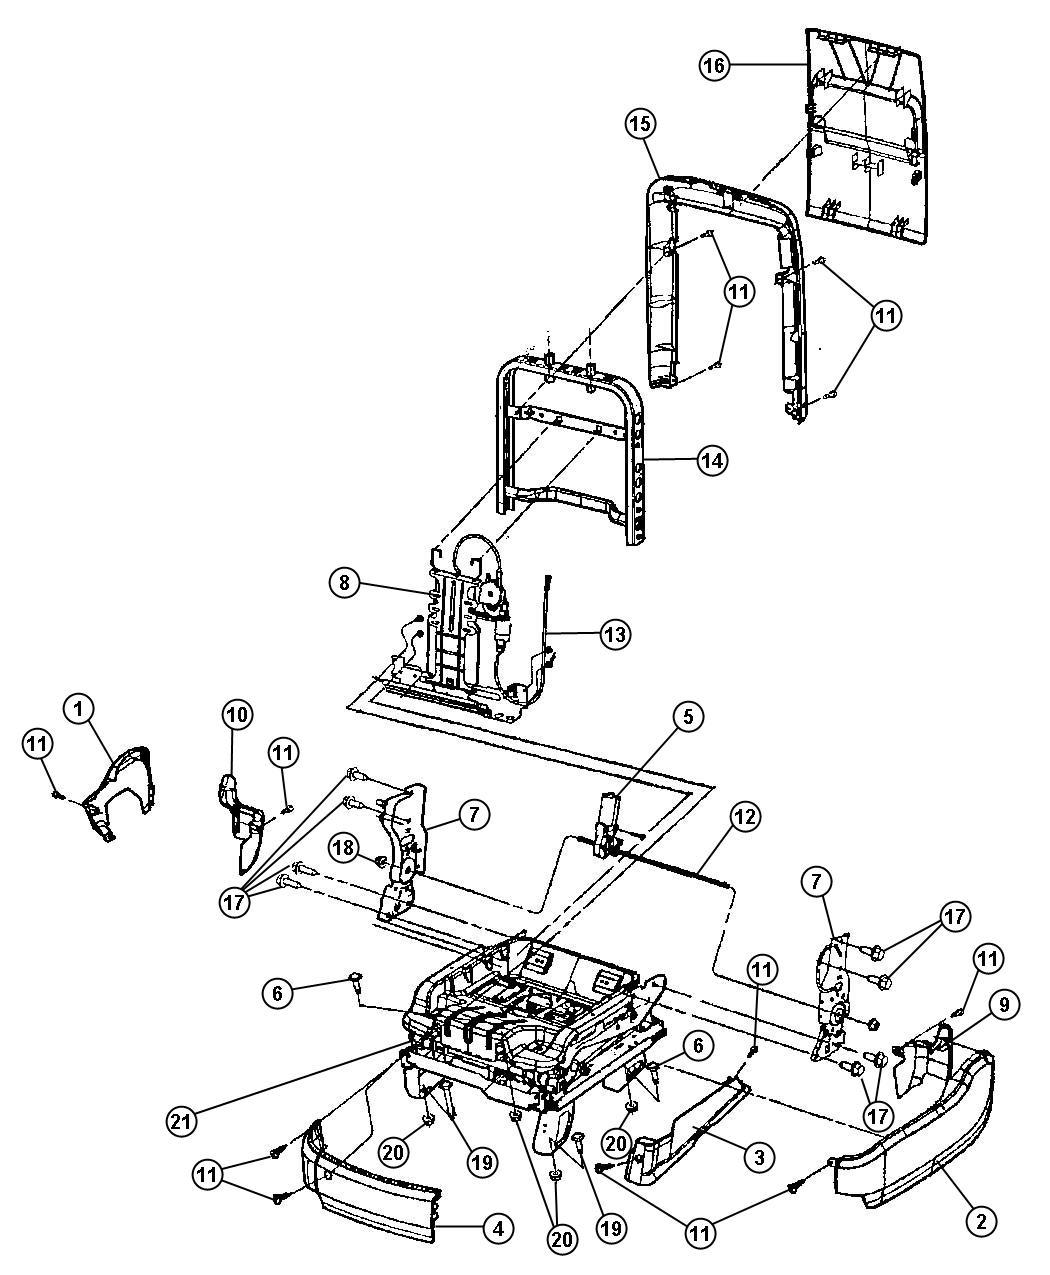 Chrysler Pacifica Motor Seat Recliner Power Seat Trim